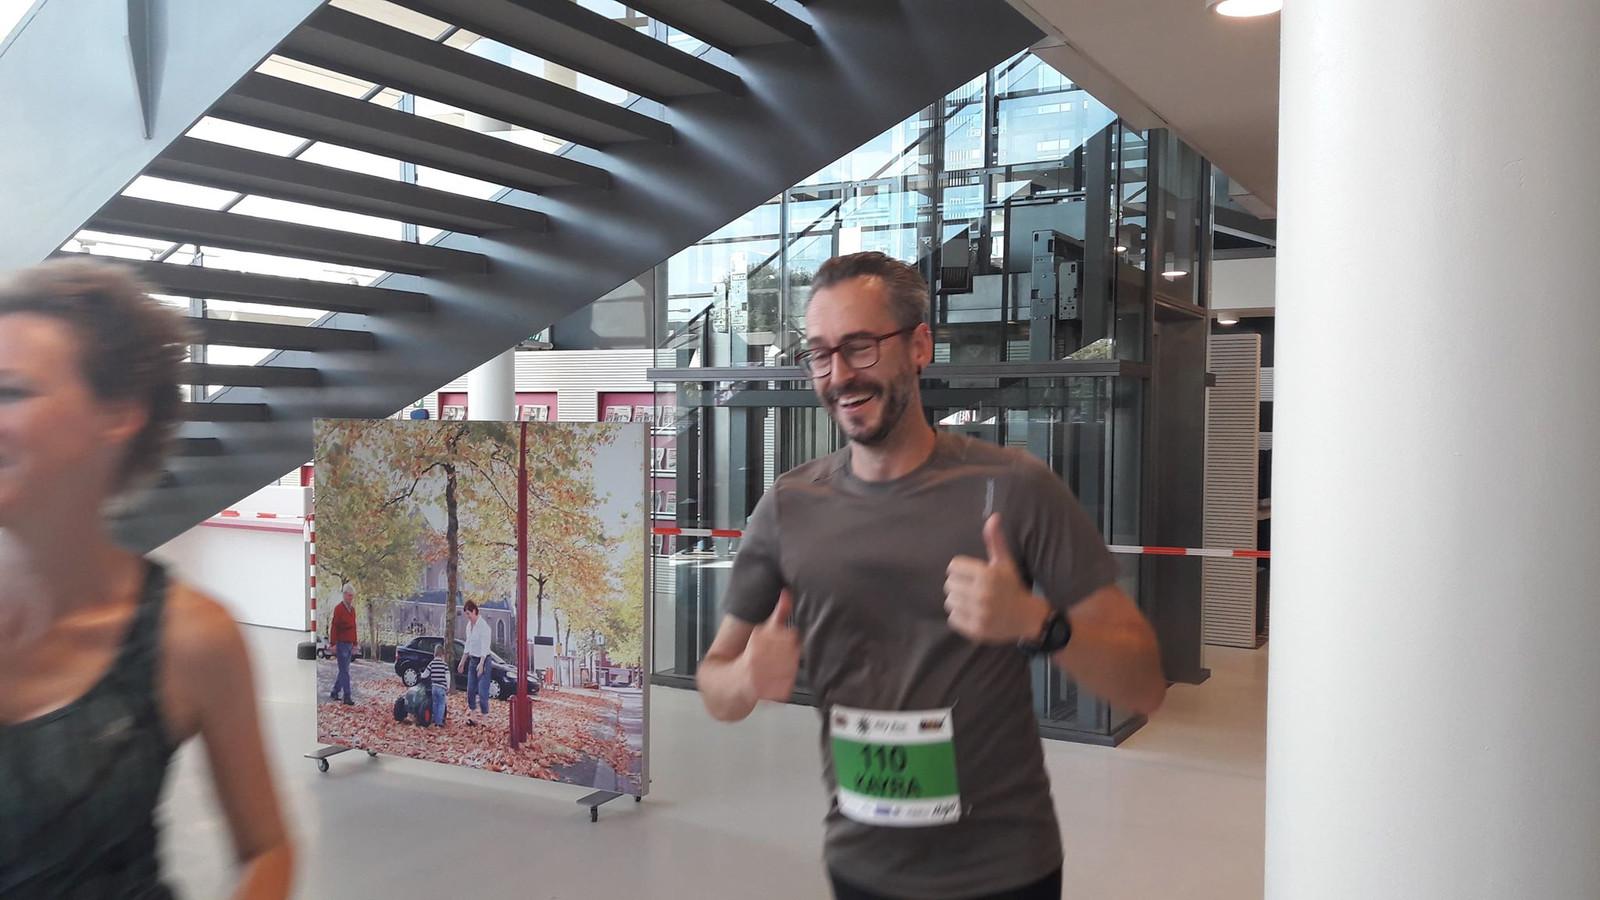 City Run Roosendaal